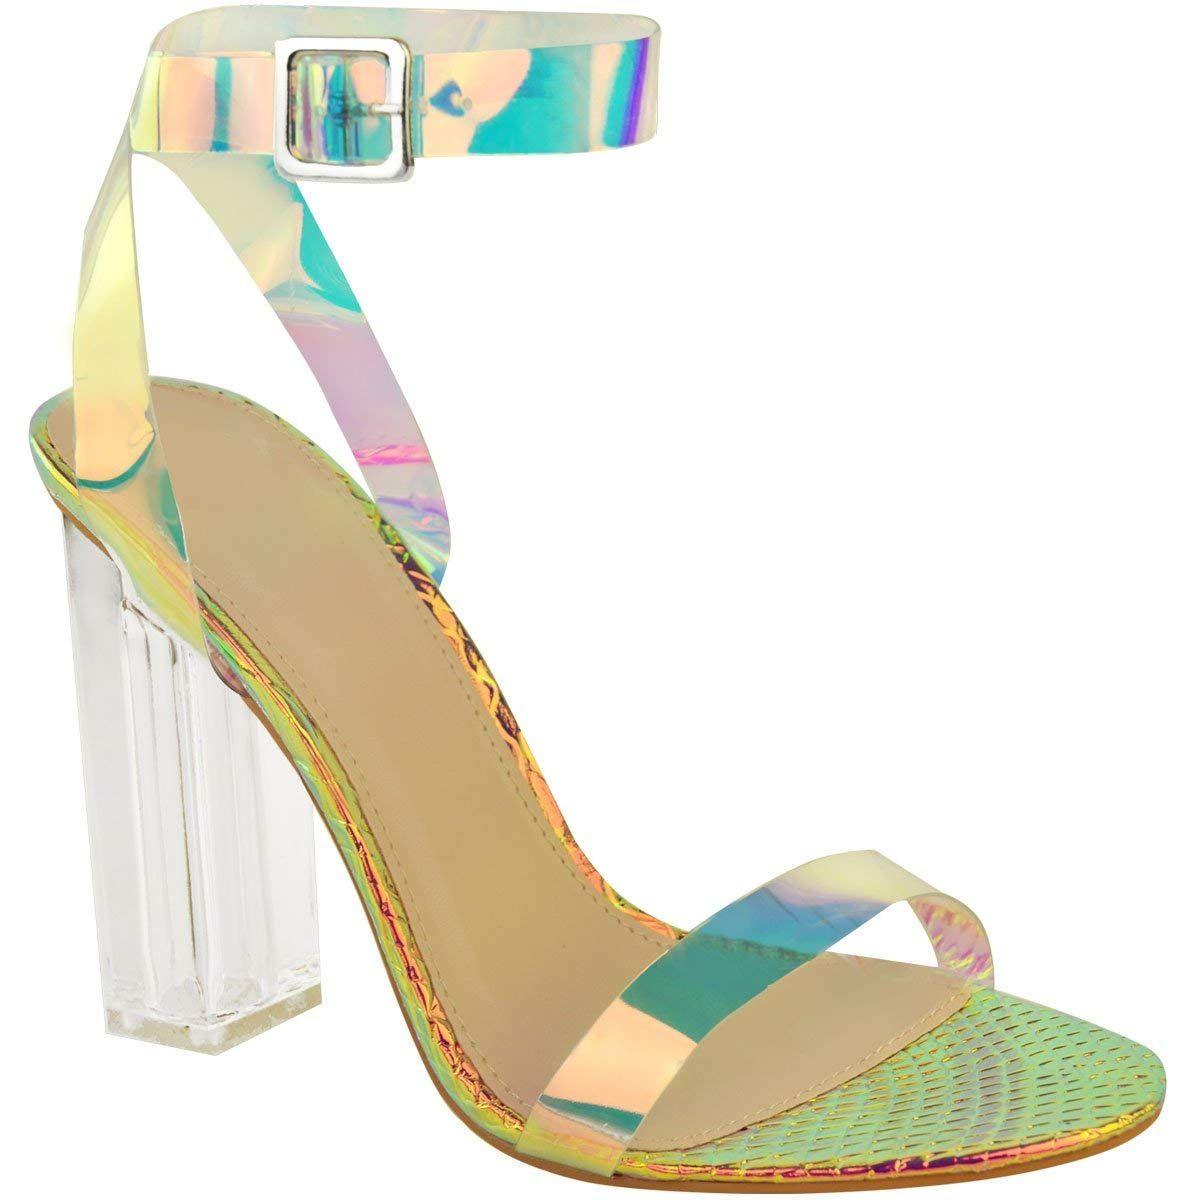 e38e0fde0eb Fashion Thirsty Womens High Heels Sandals Hologram Perspex Clear ...